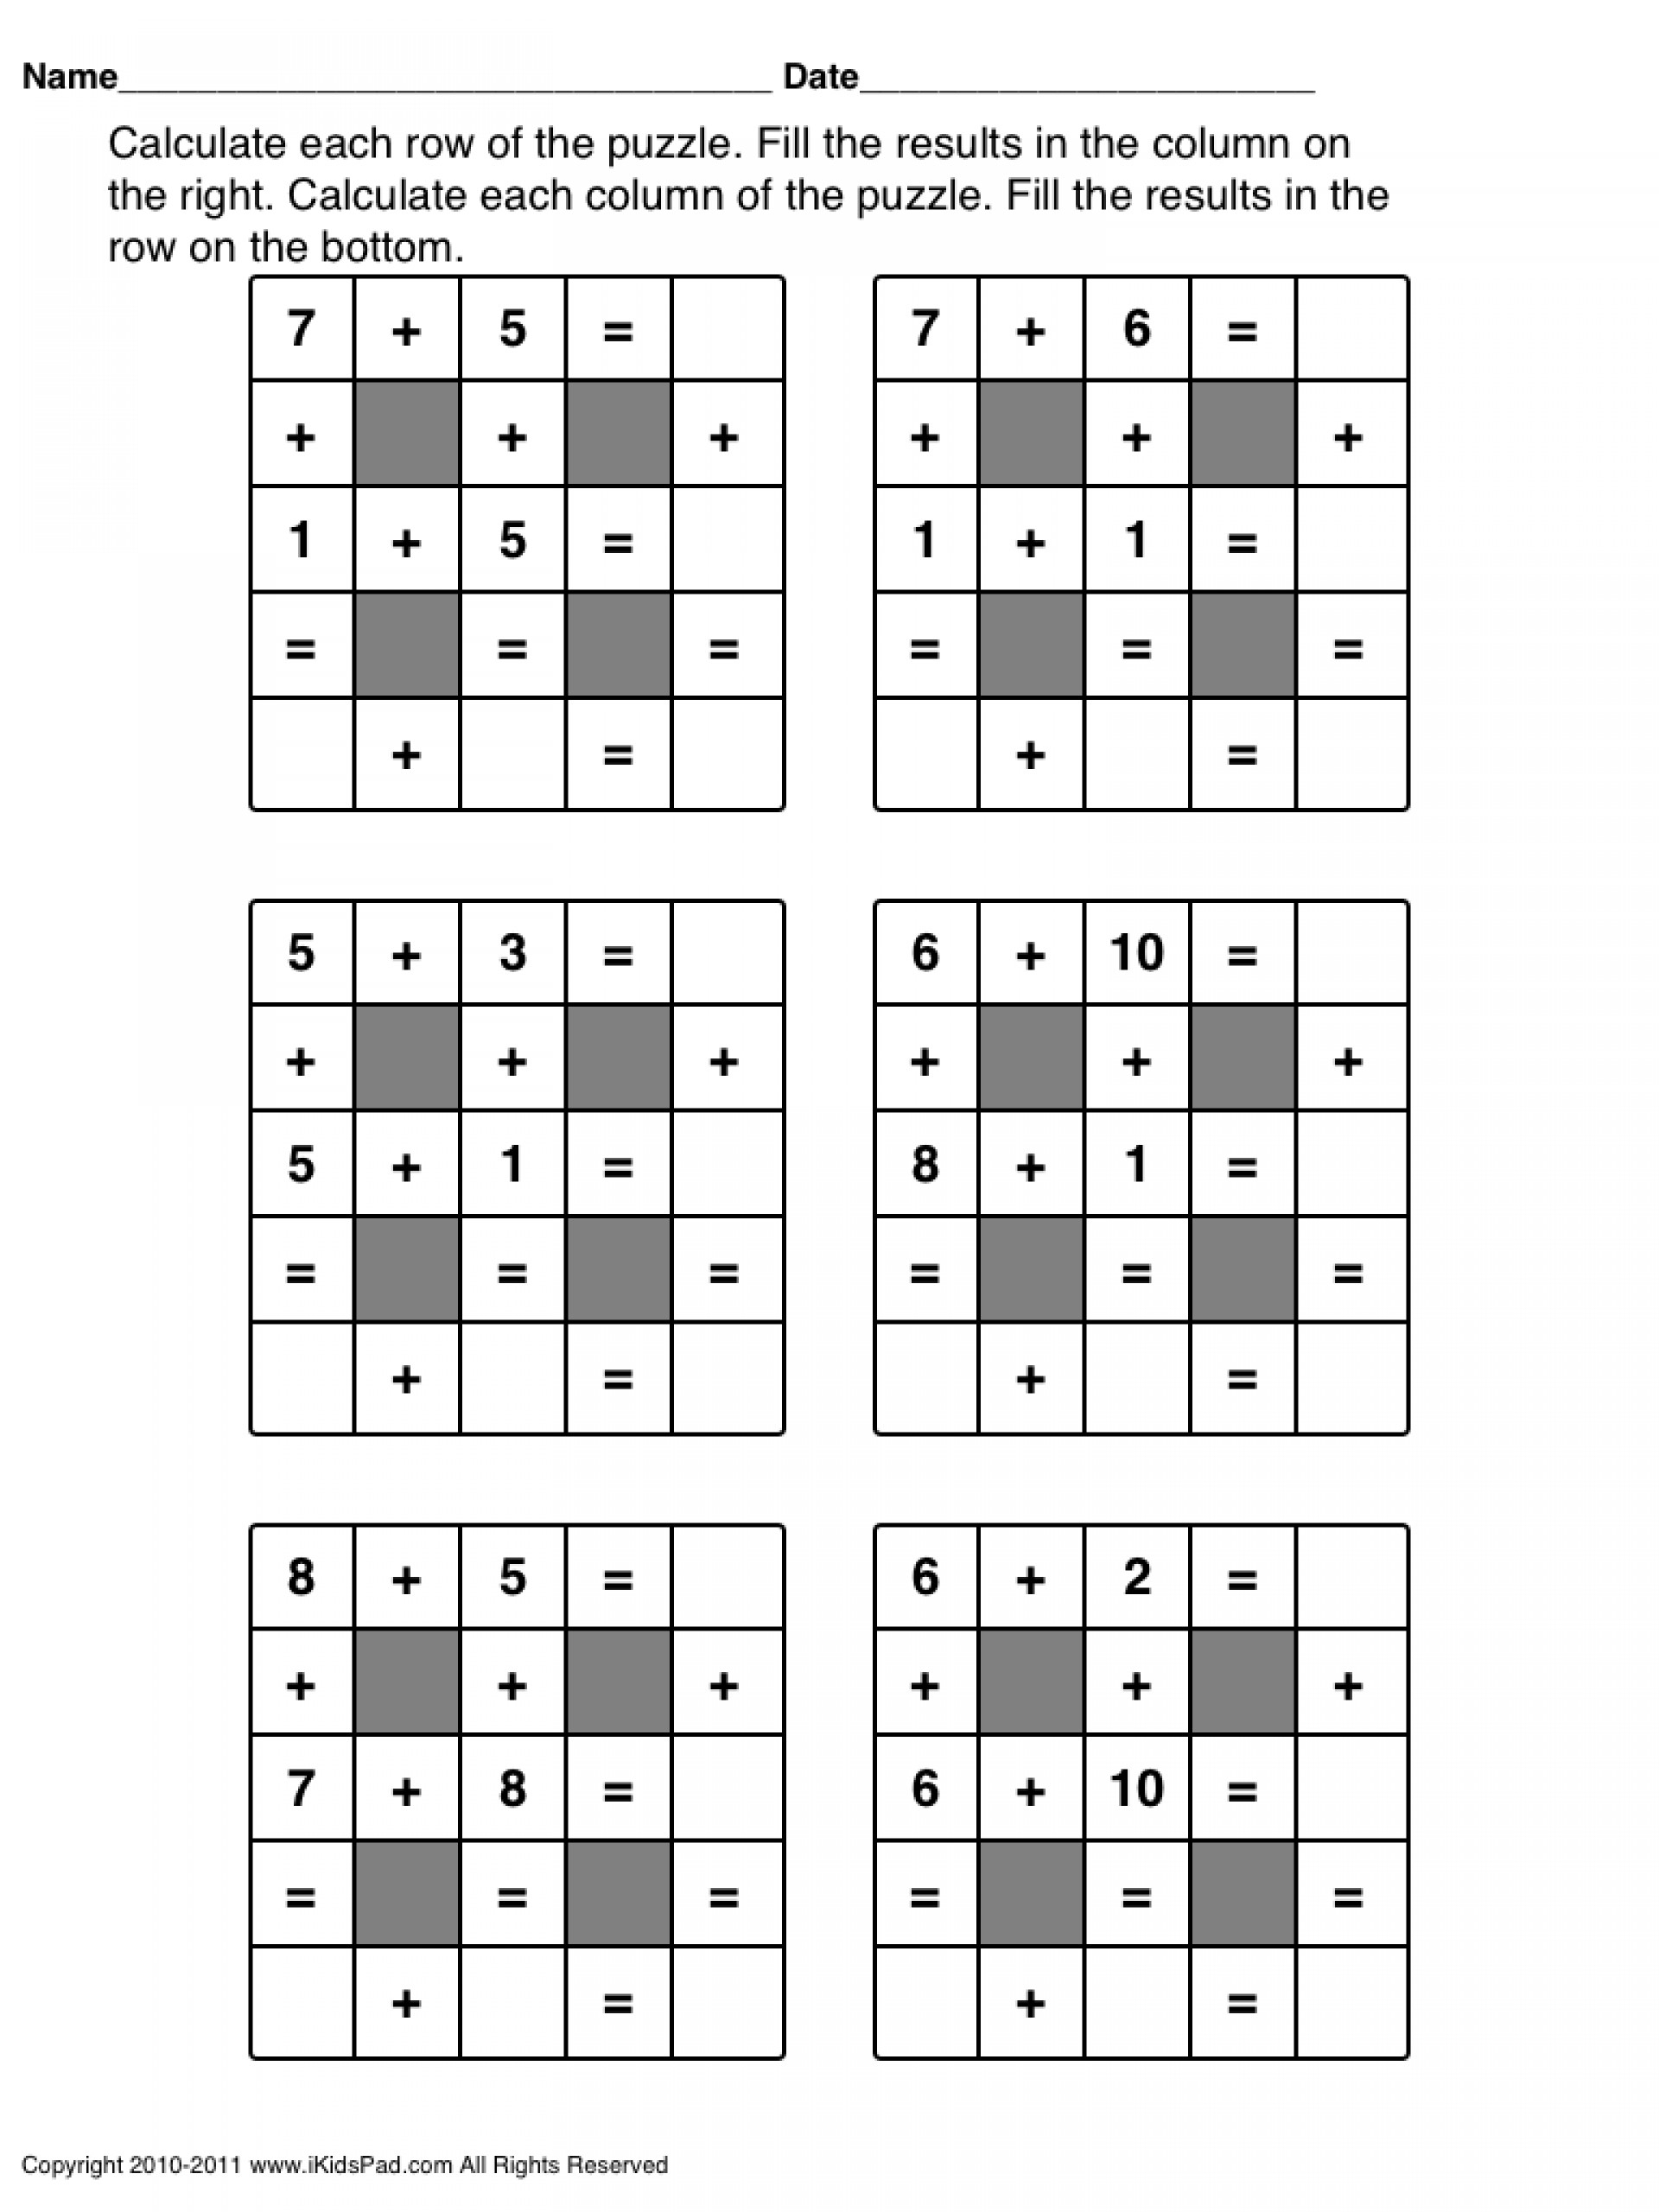 Free Printable Thanksgiving Math Worksheets For 3Rd Grade Turkey 1St | Free Printable Thanksgiving Math Worksheets